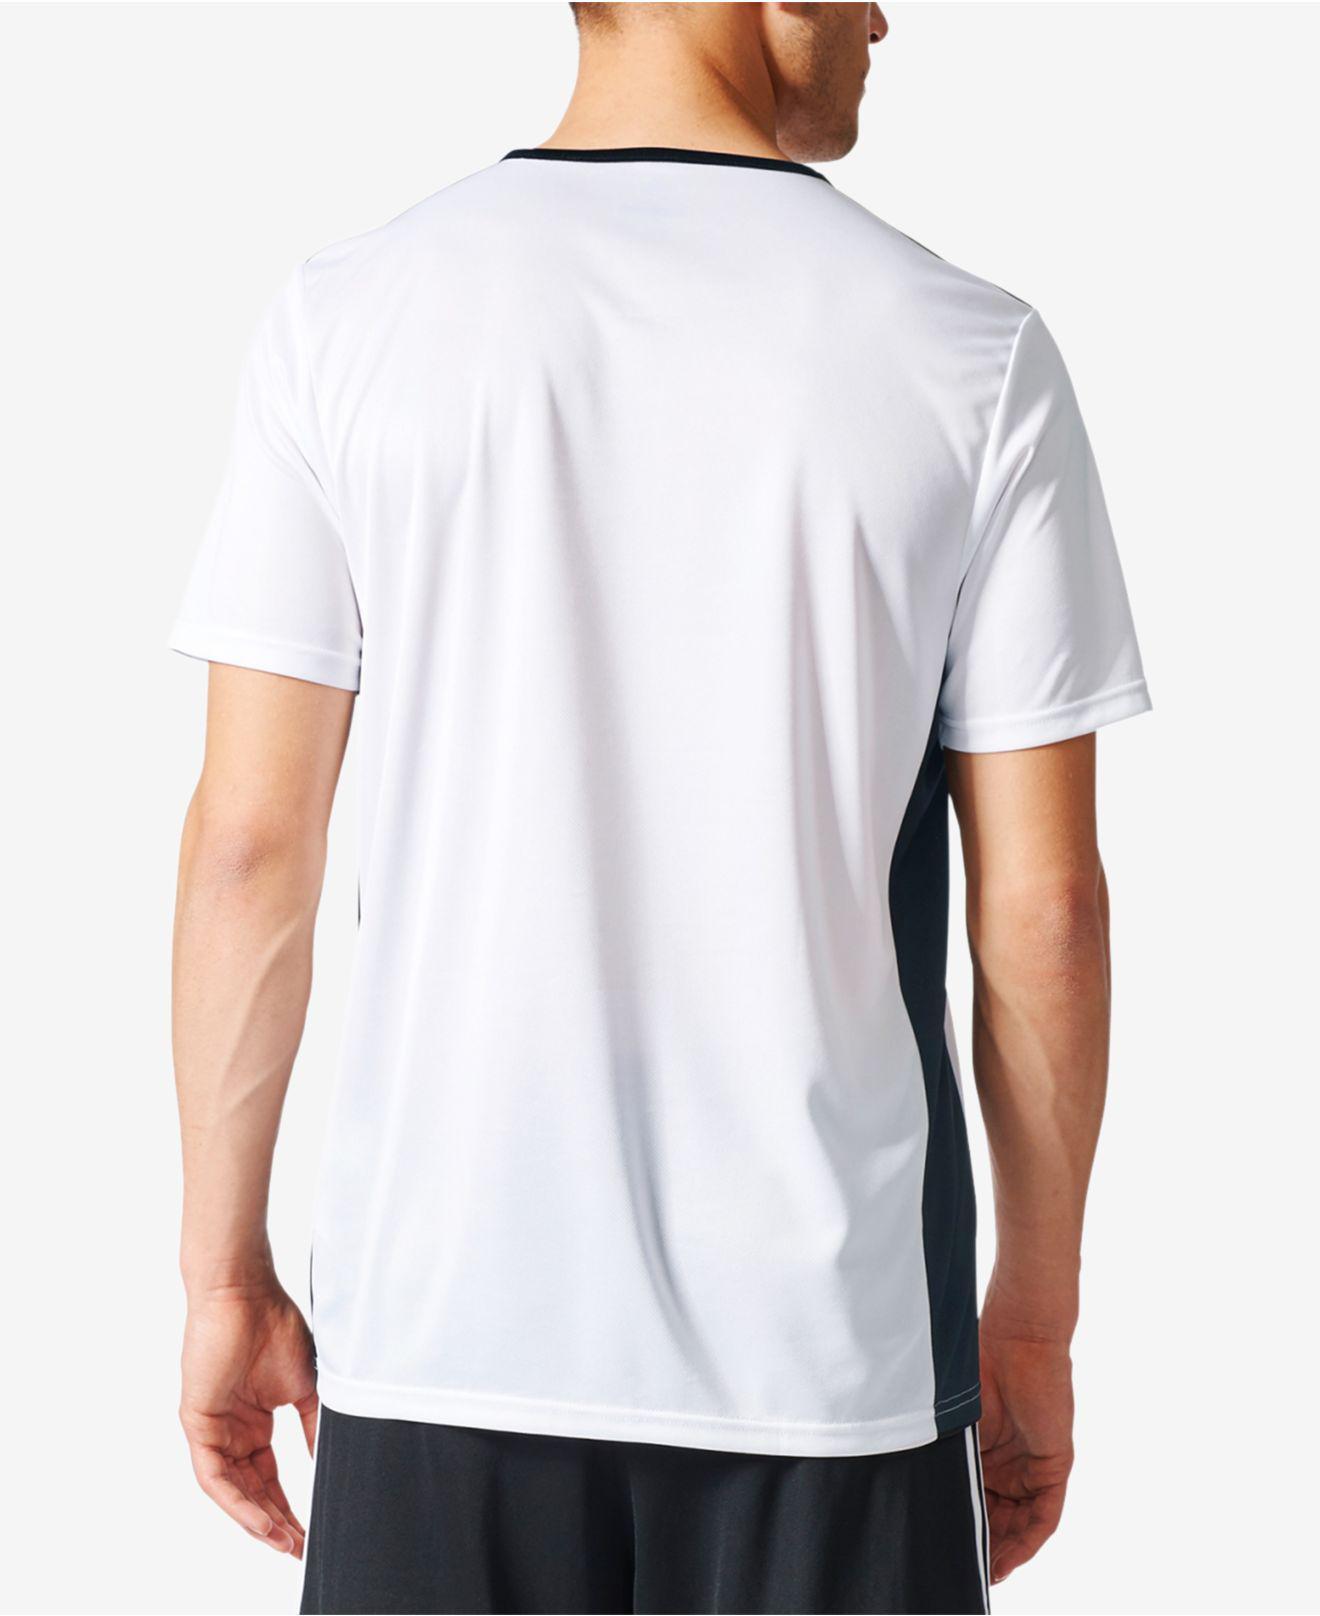 ec1649b81 adidas Men s Entrada Climalite® Soccer Shirt in White for Men - Lyst